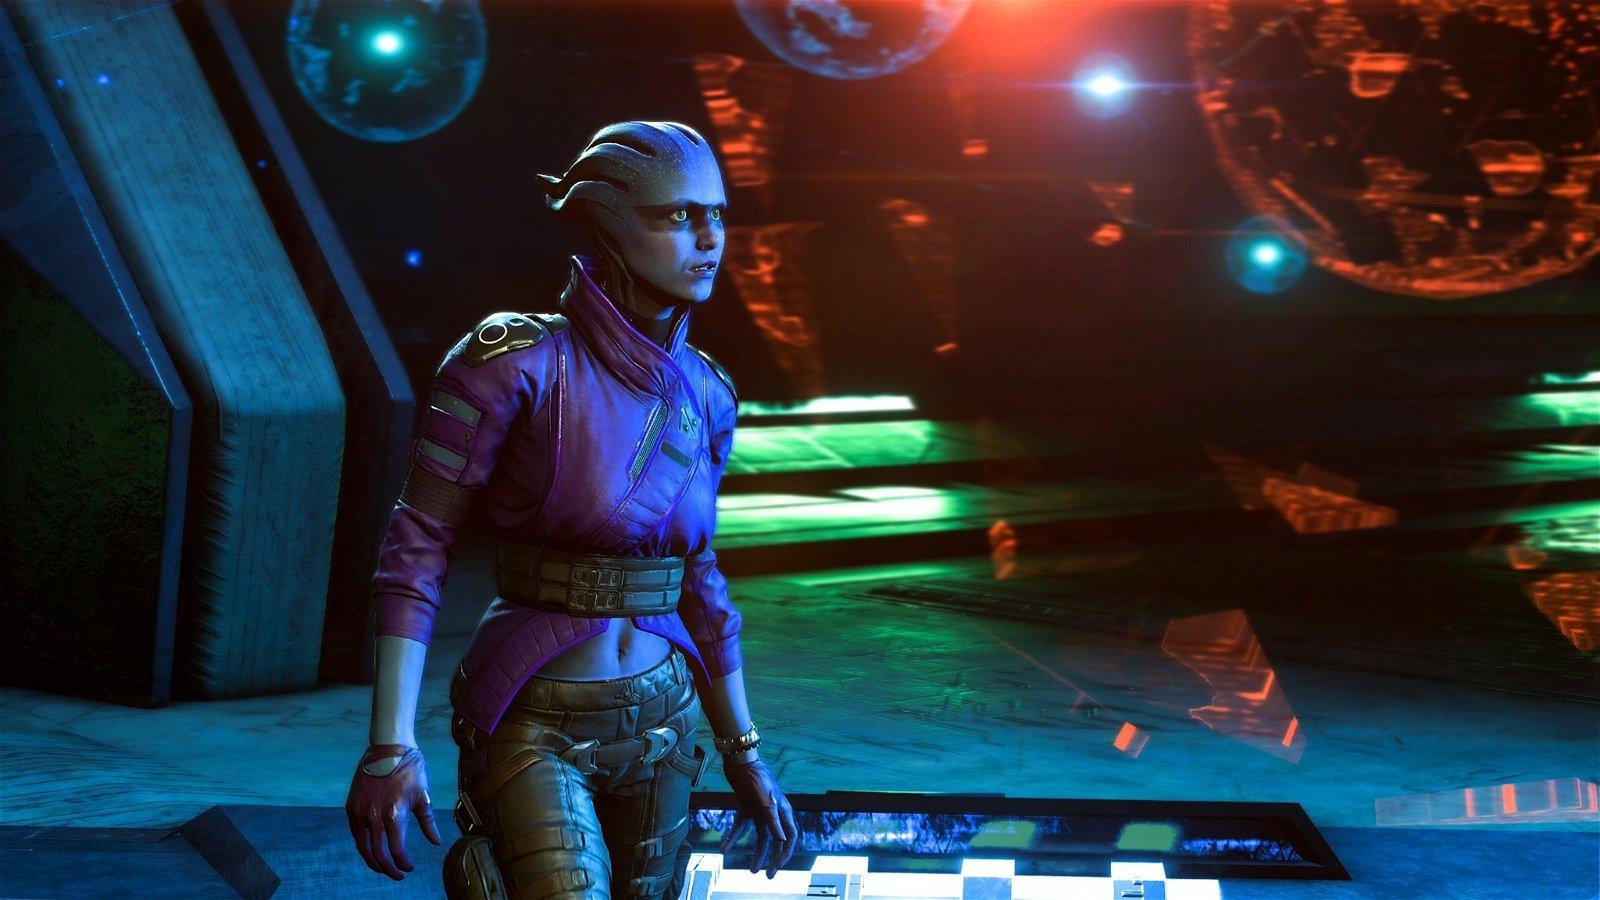 Mass Effect: Andromeda irá a 30 fps tanto en PlayStation 4 como PlayStation 4 Pro